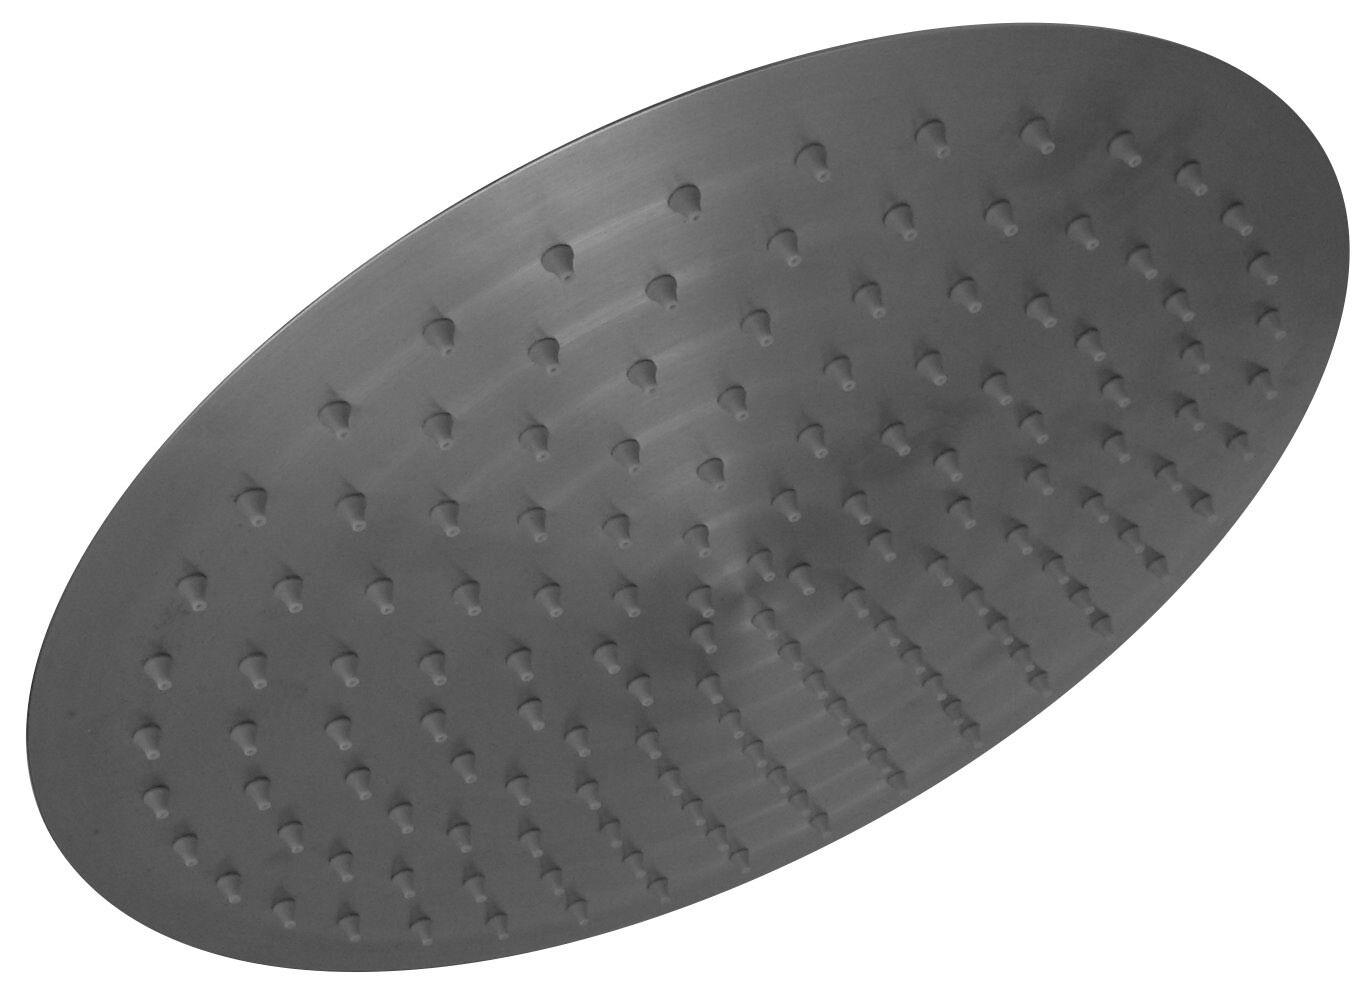 Acero inox Ducha lluvia Teléfono de Ducha O300mm slim cepillado de lanwa